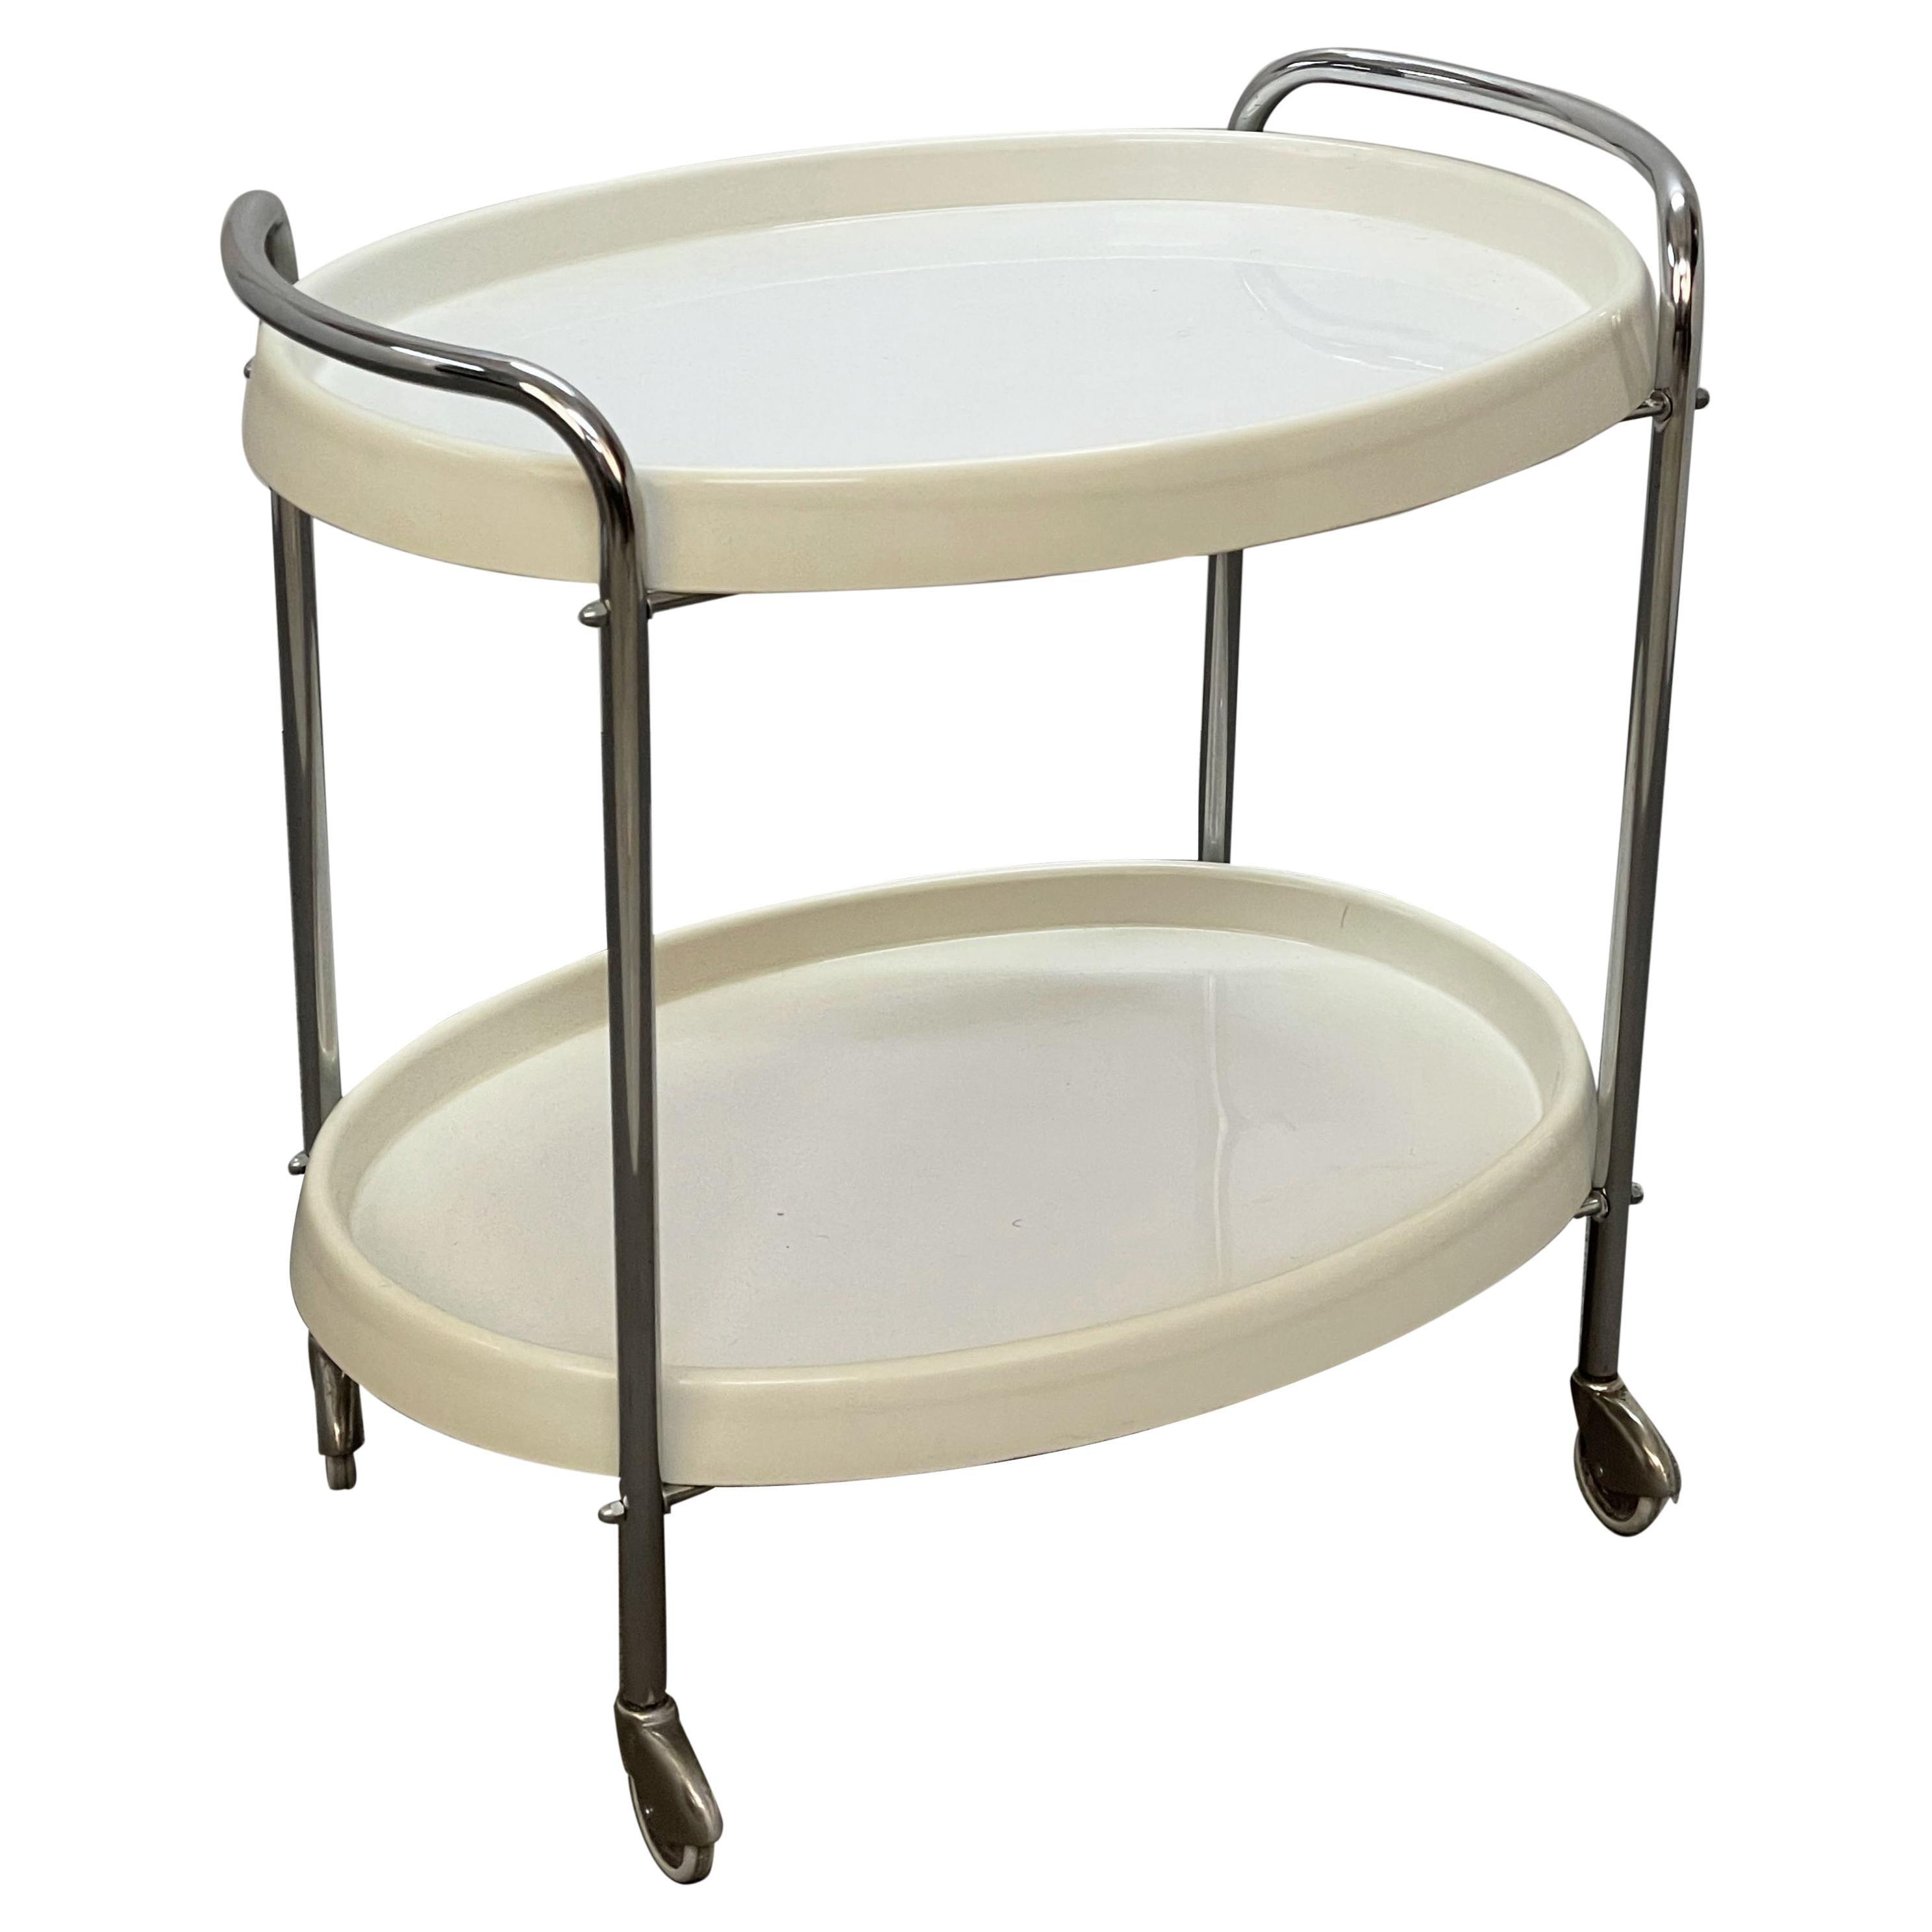 Midcentury White Plastic and Metal Chrome Italian Bar Cart Oval, 1950s